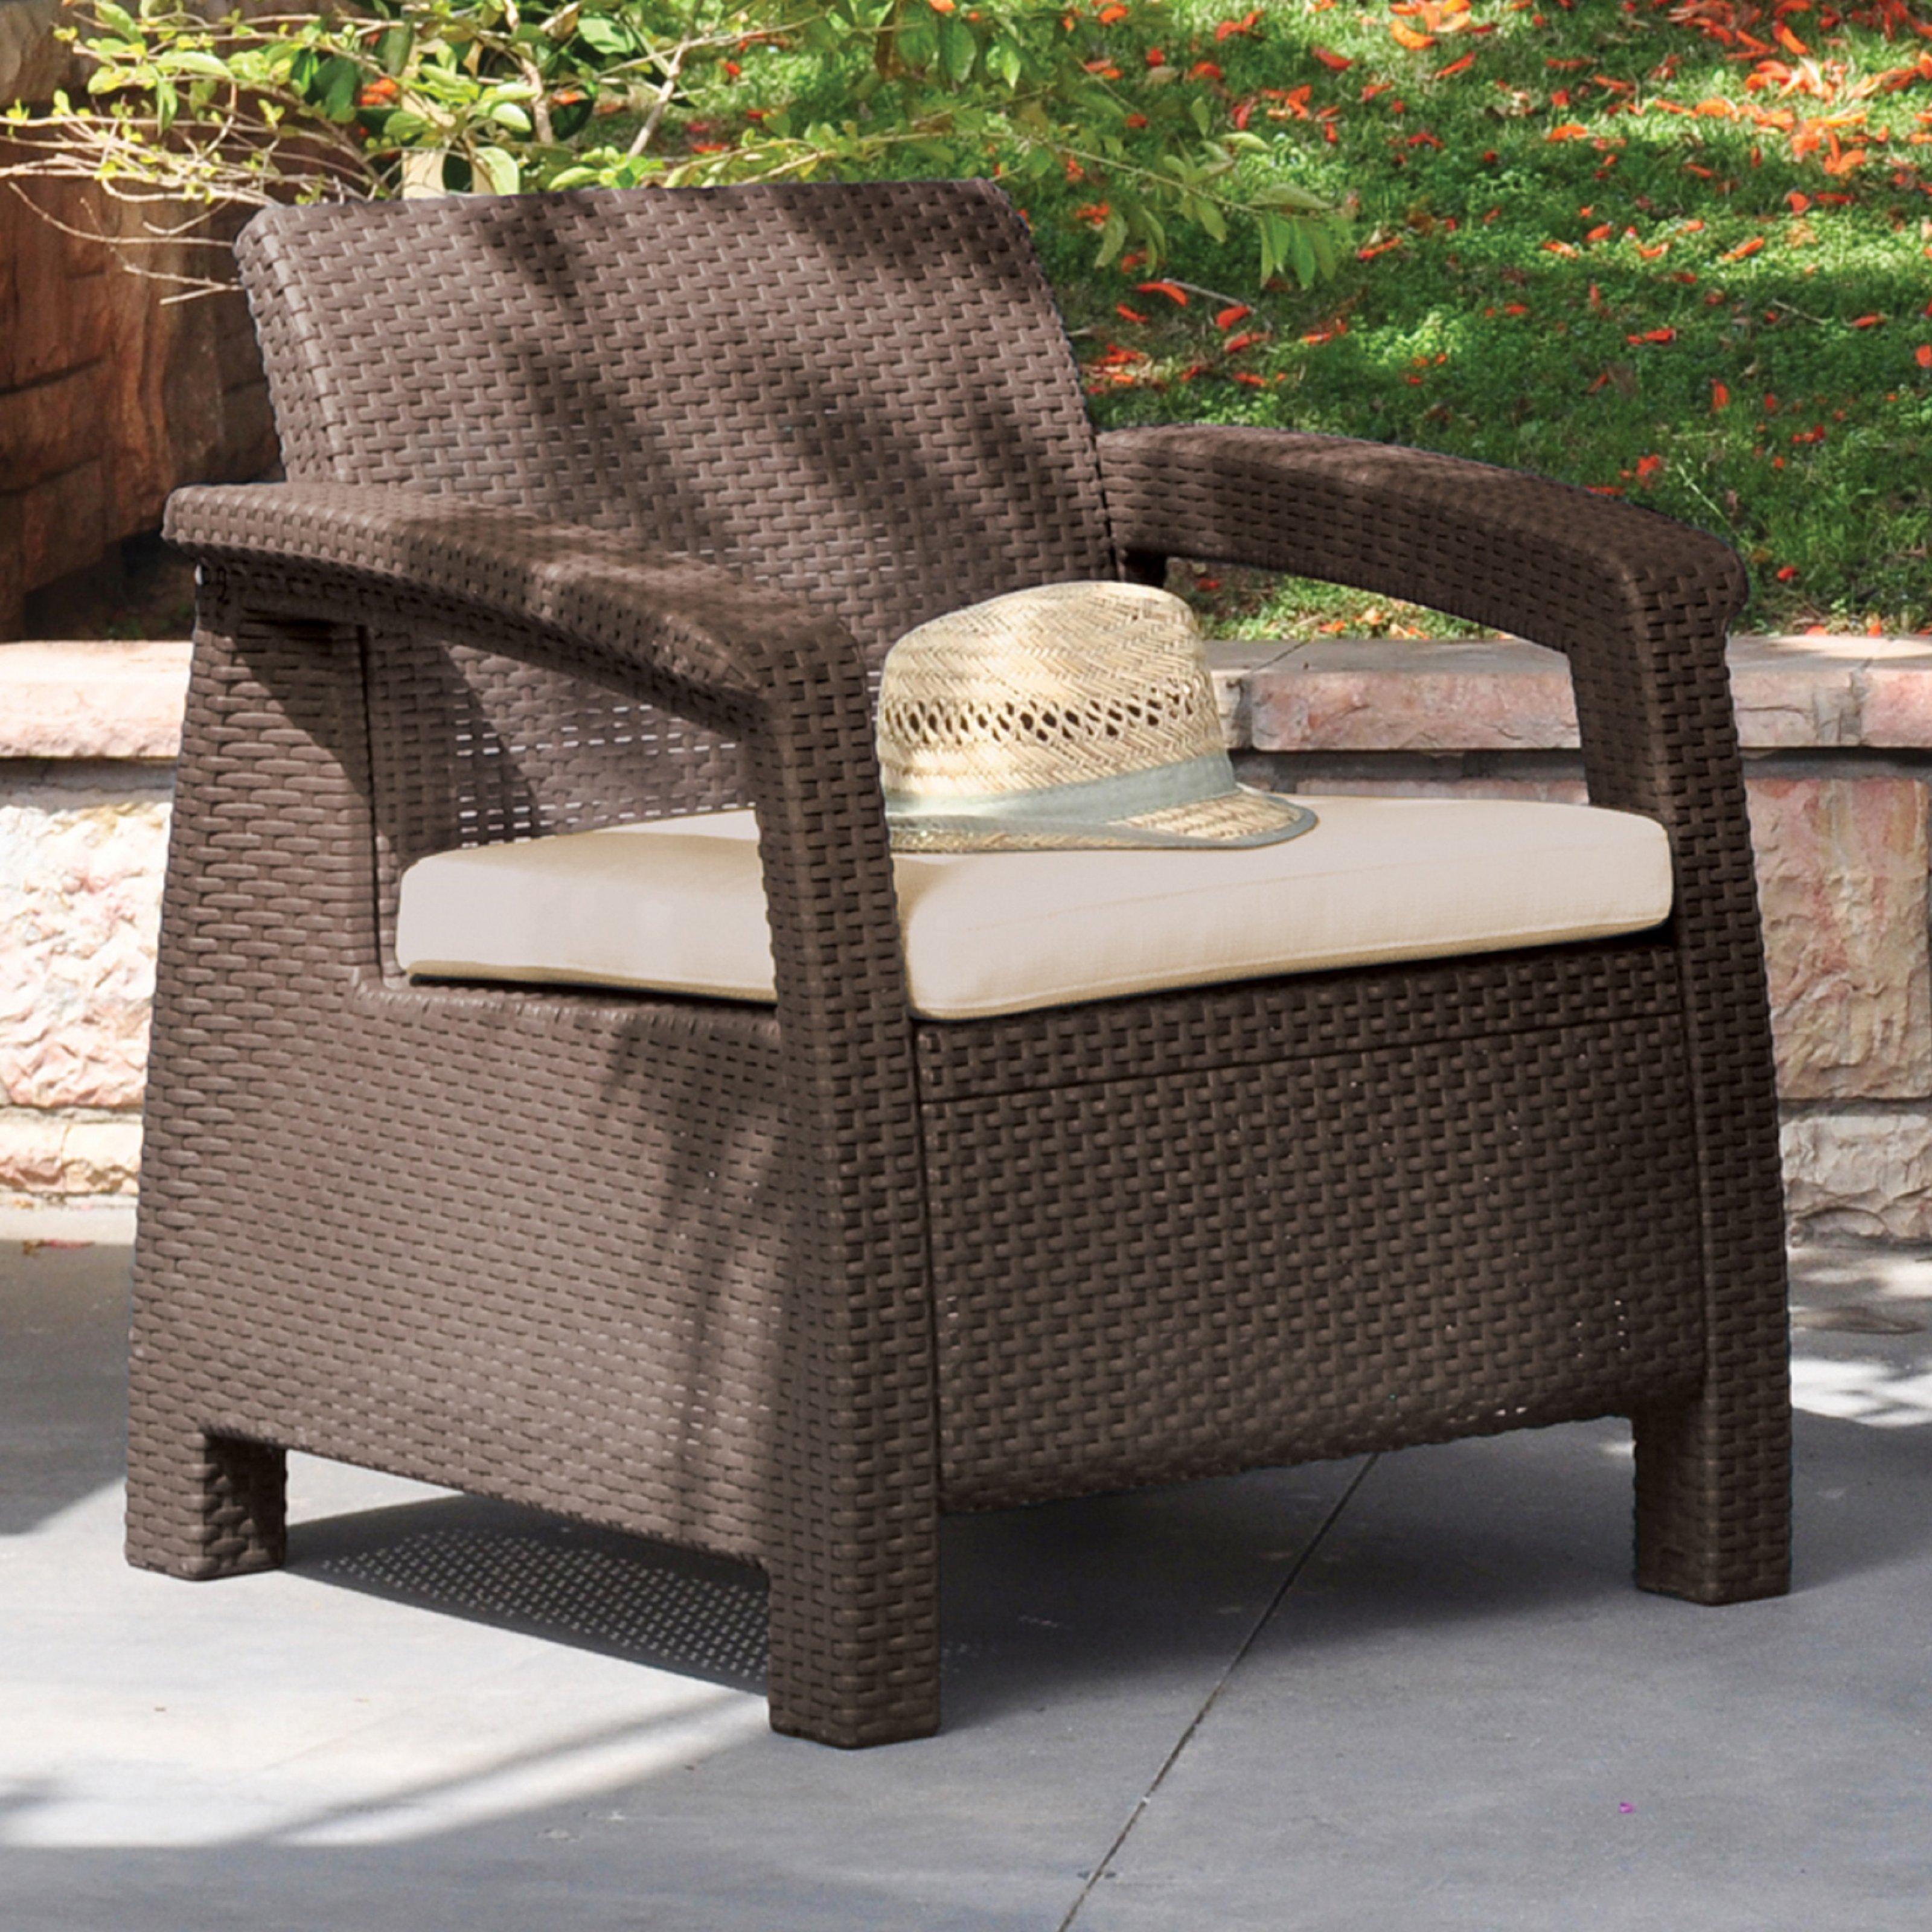 Keter Corfu 2 Seater Rattan Sofa Outdoor Furniture